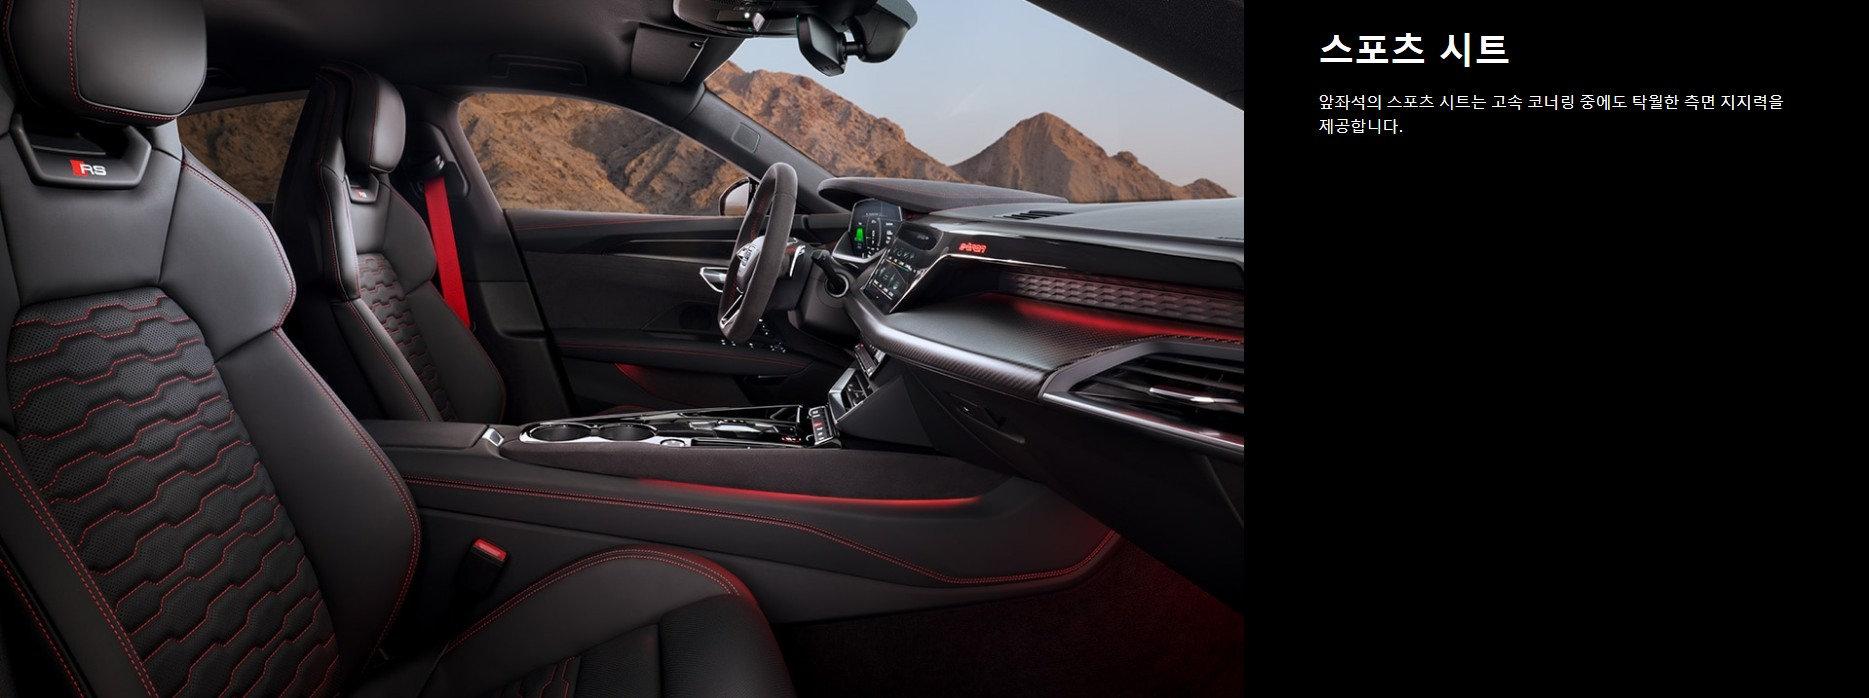 RS etron GT 9.jpg